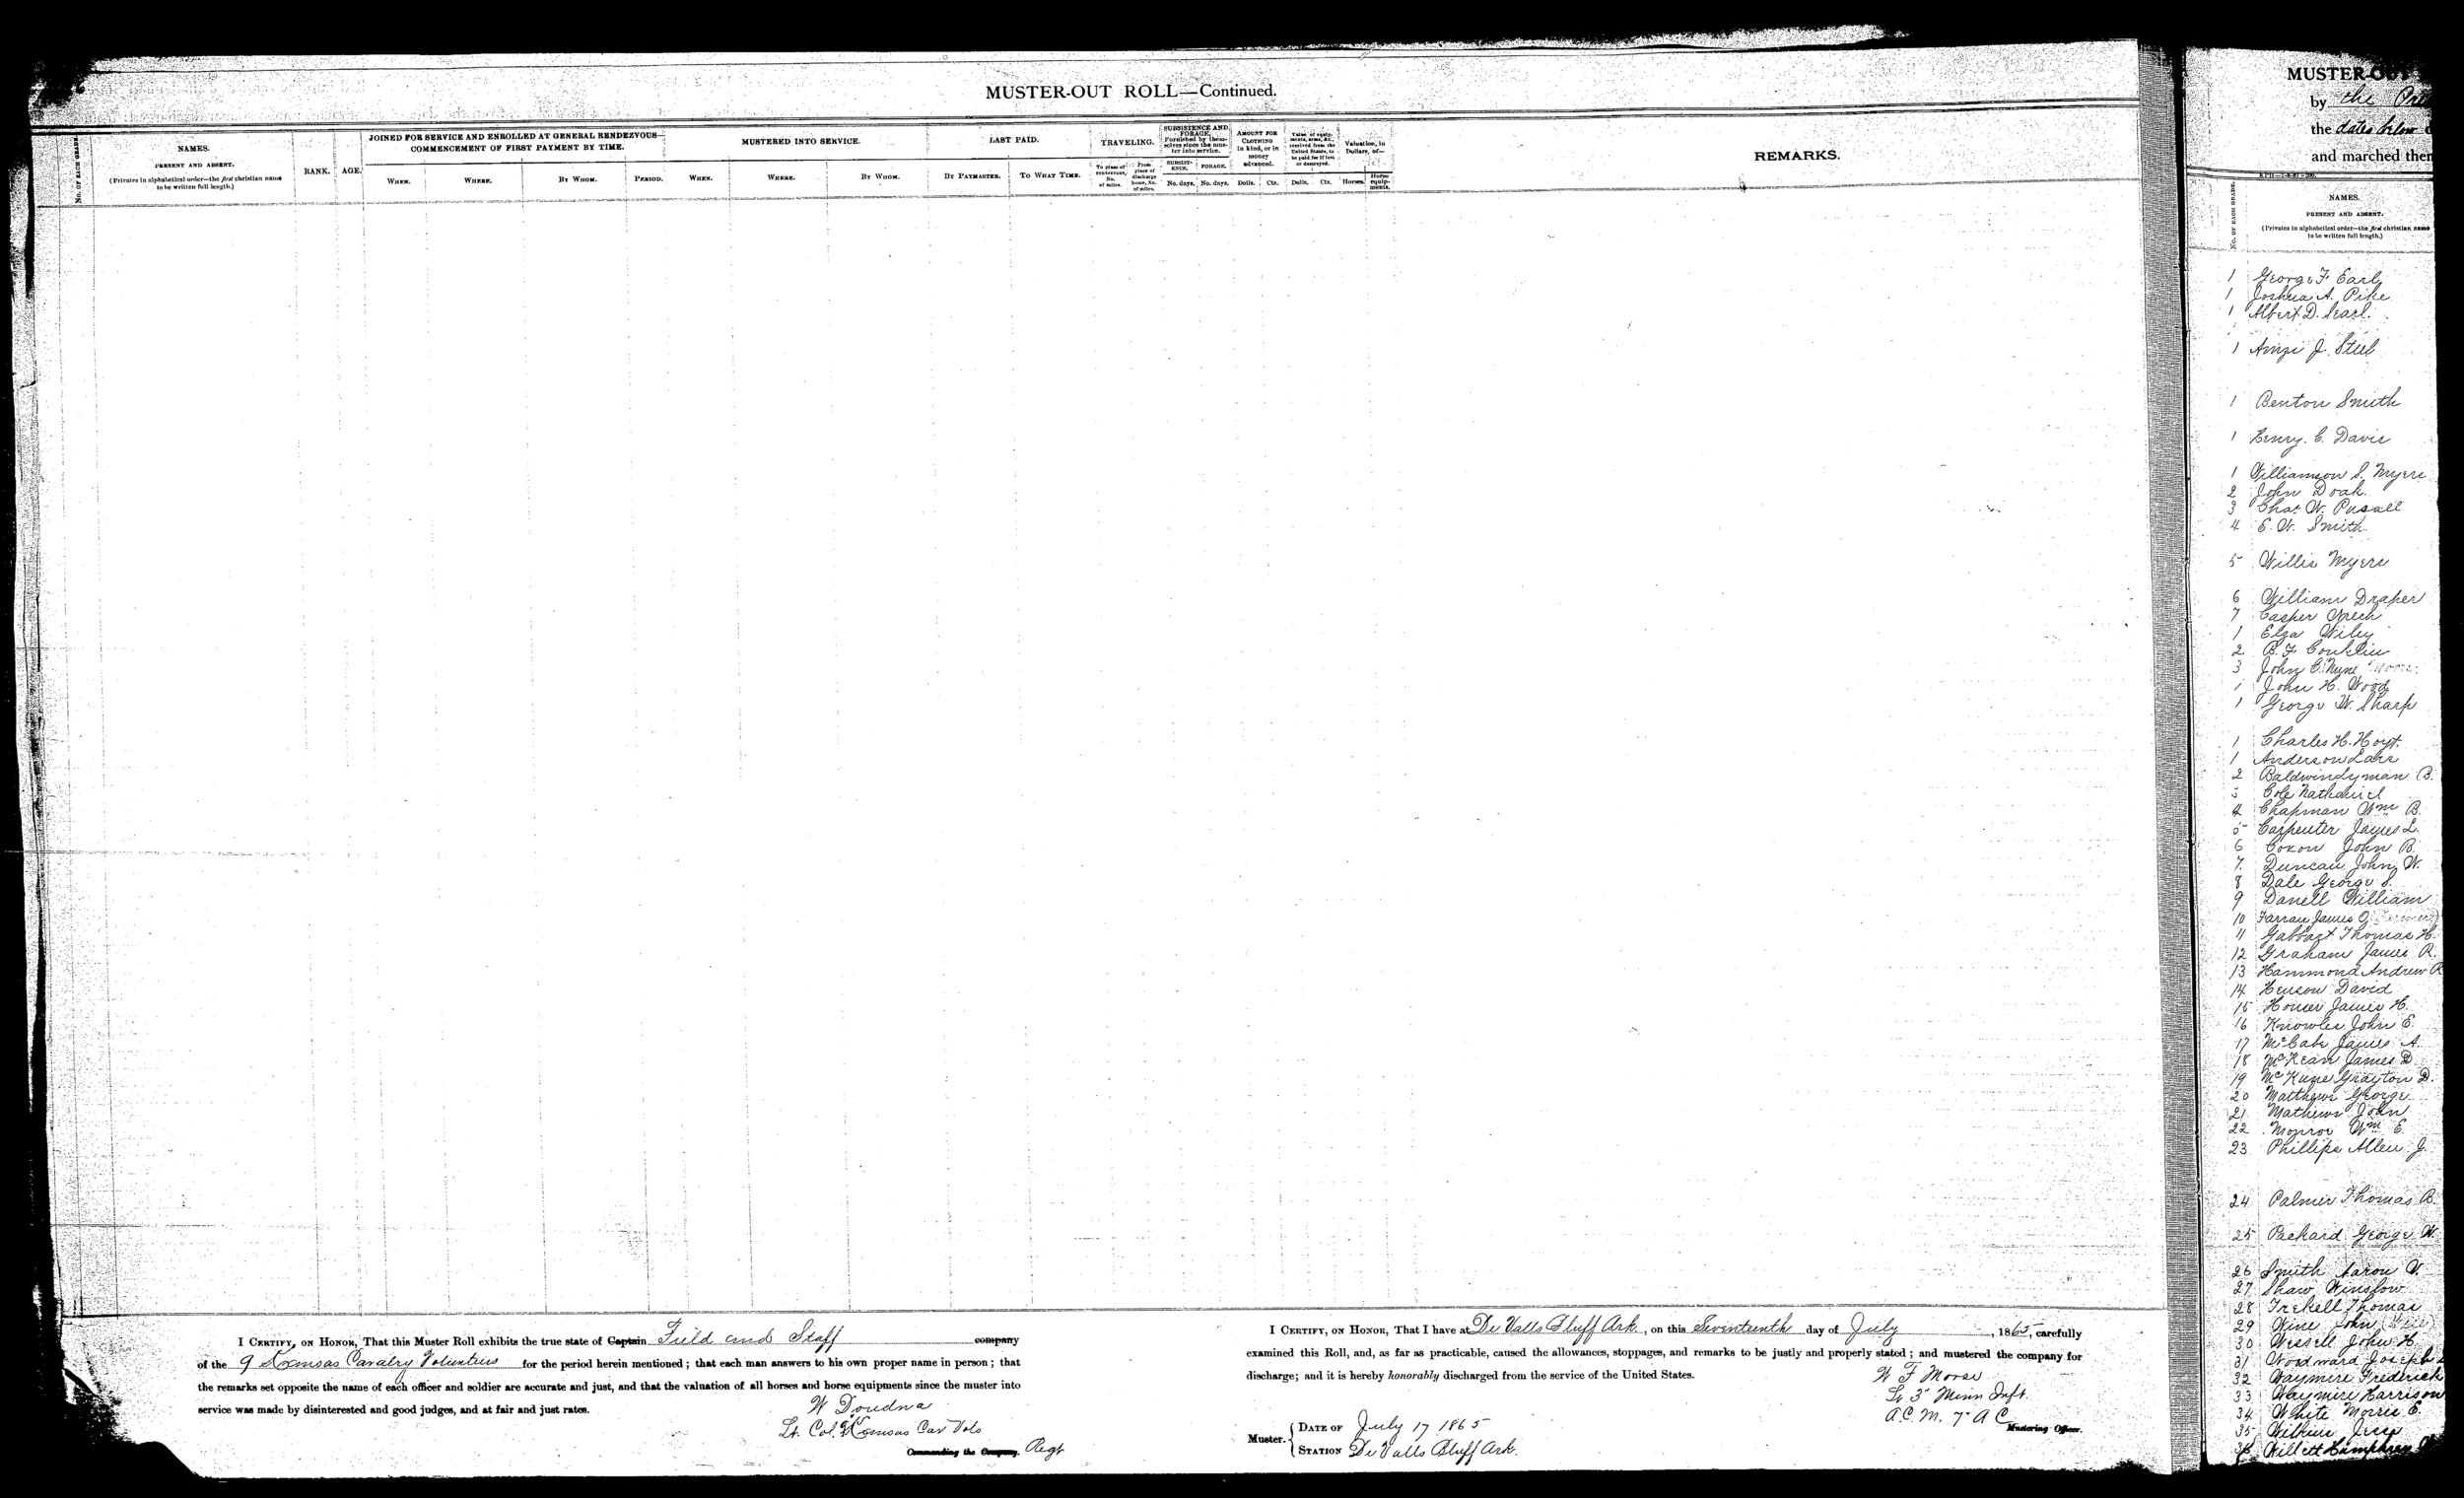 Muster out roll, Ninth Regiment, Cavalry, Kansas Civil War Volunteers regiment, volume 3 - 5